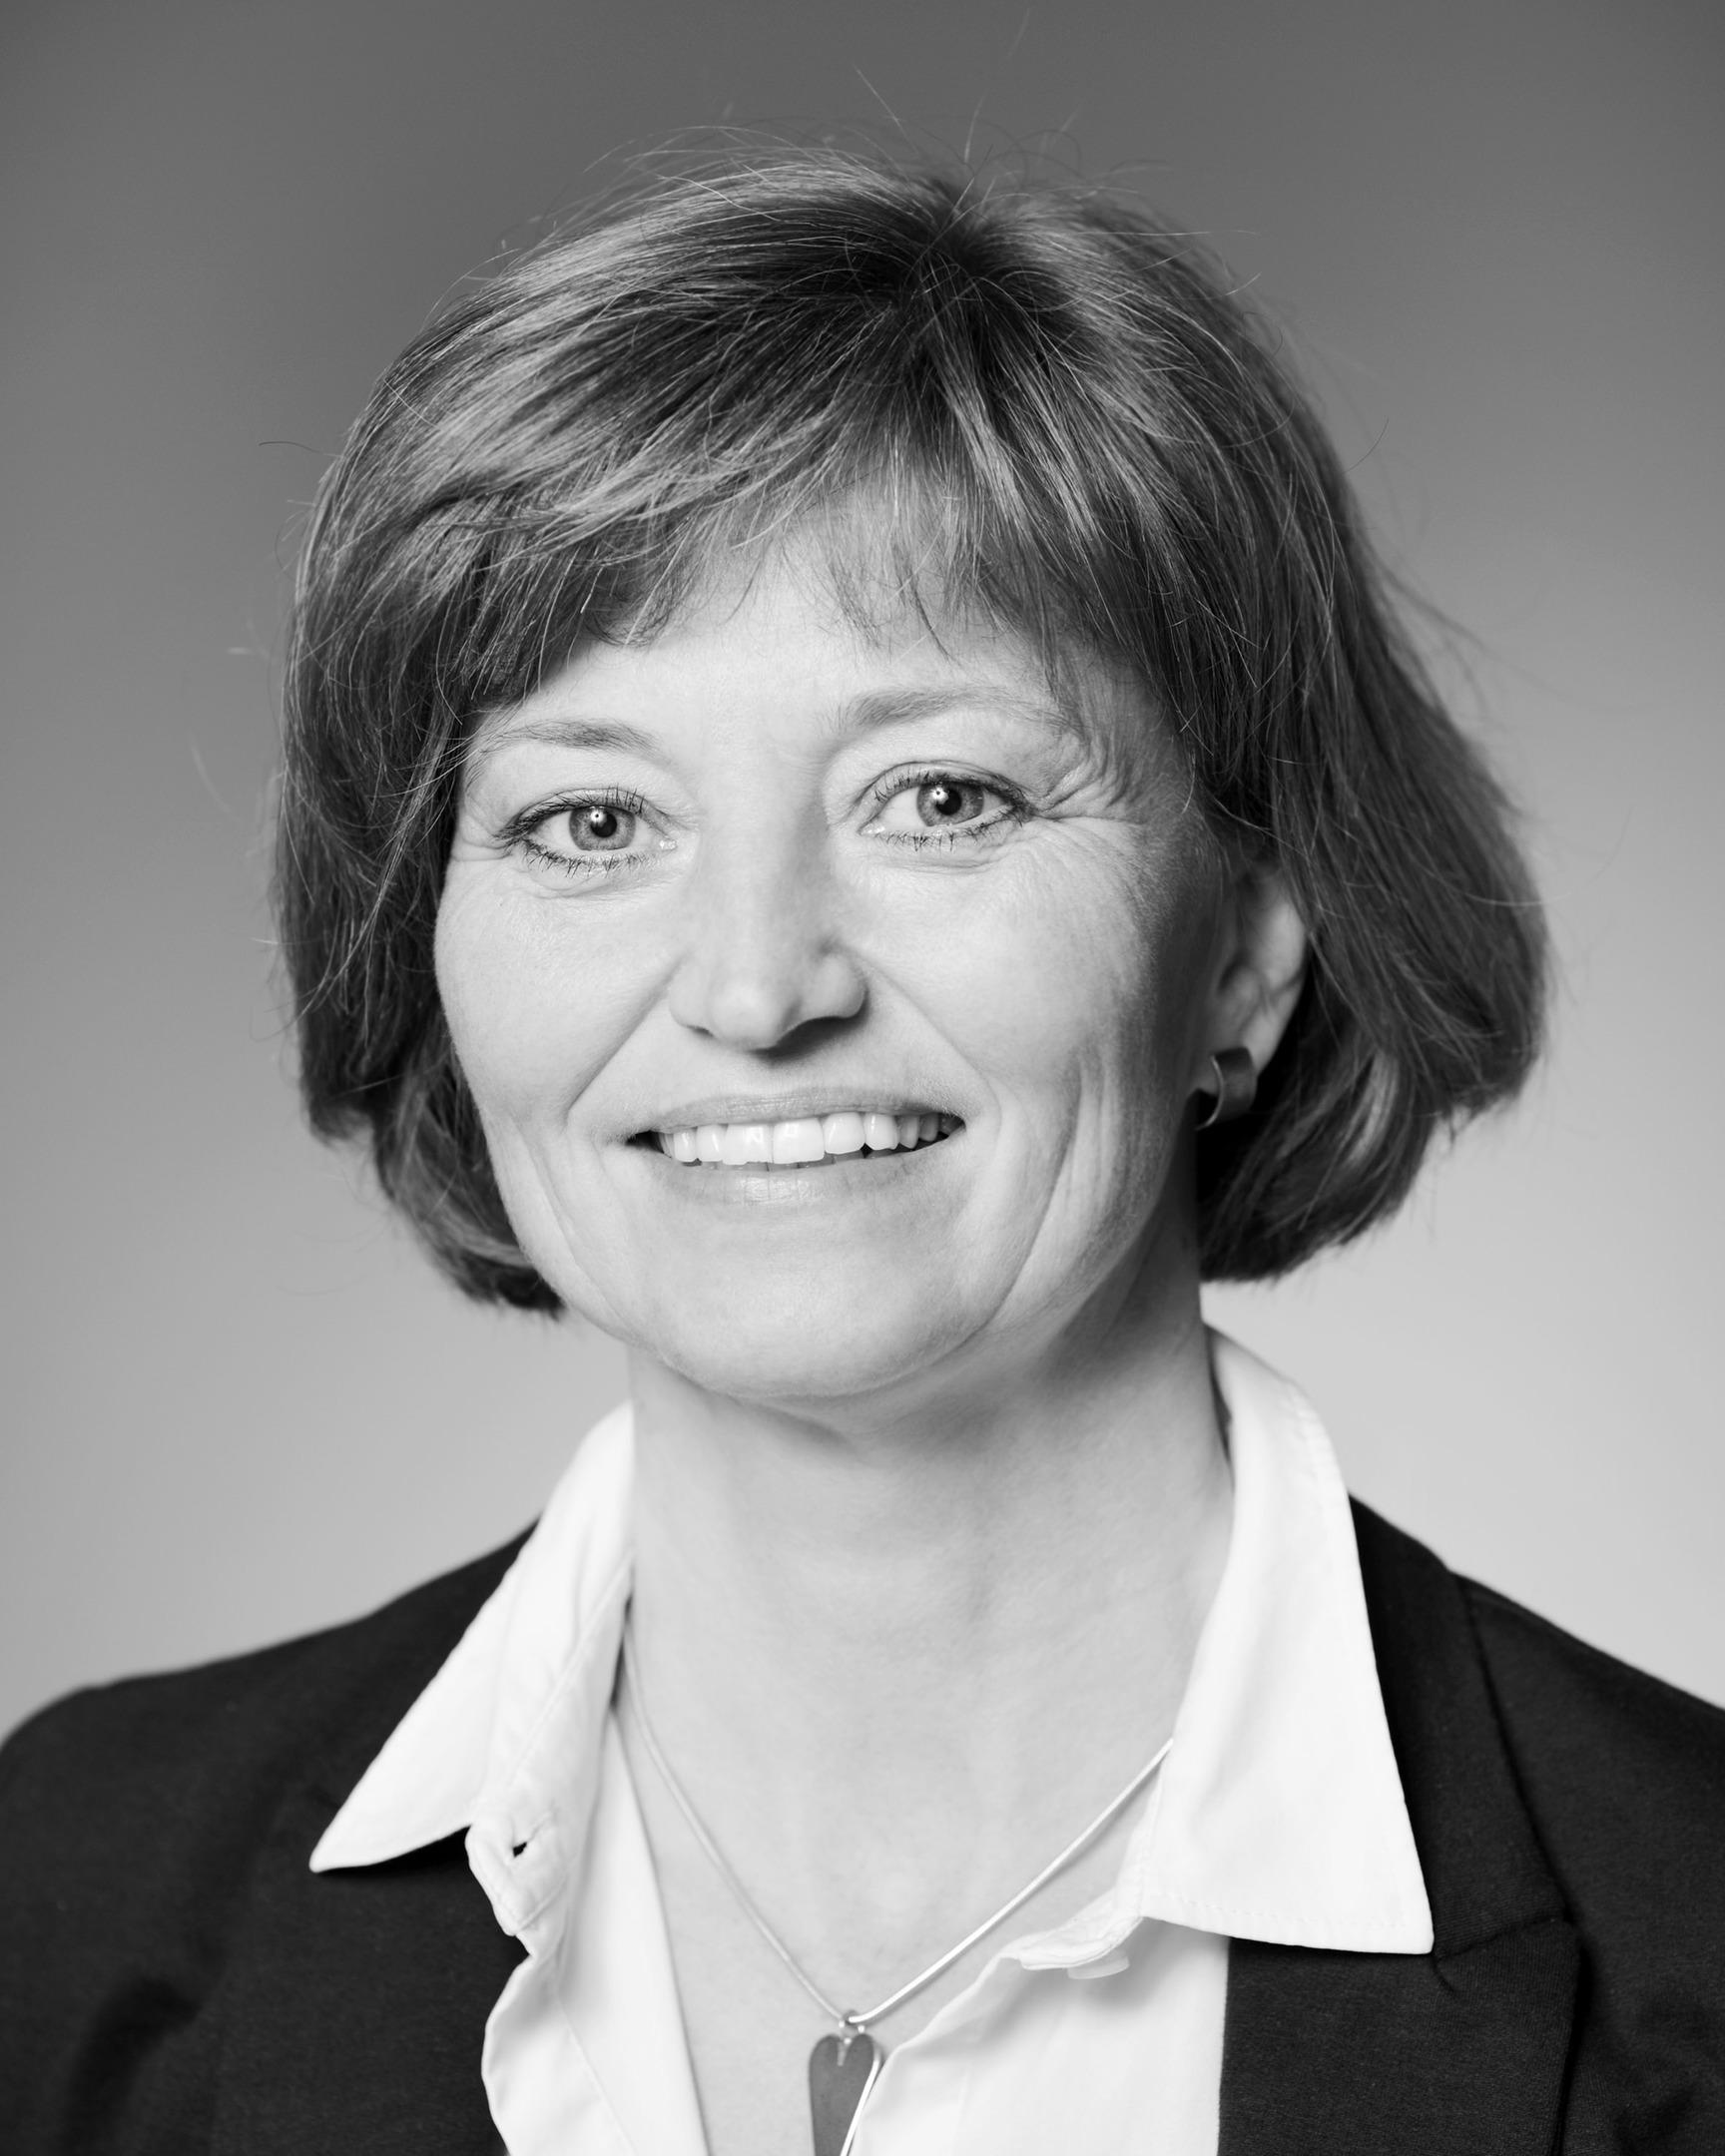 Anne Myhrvold